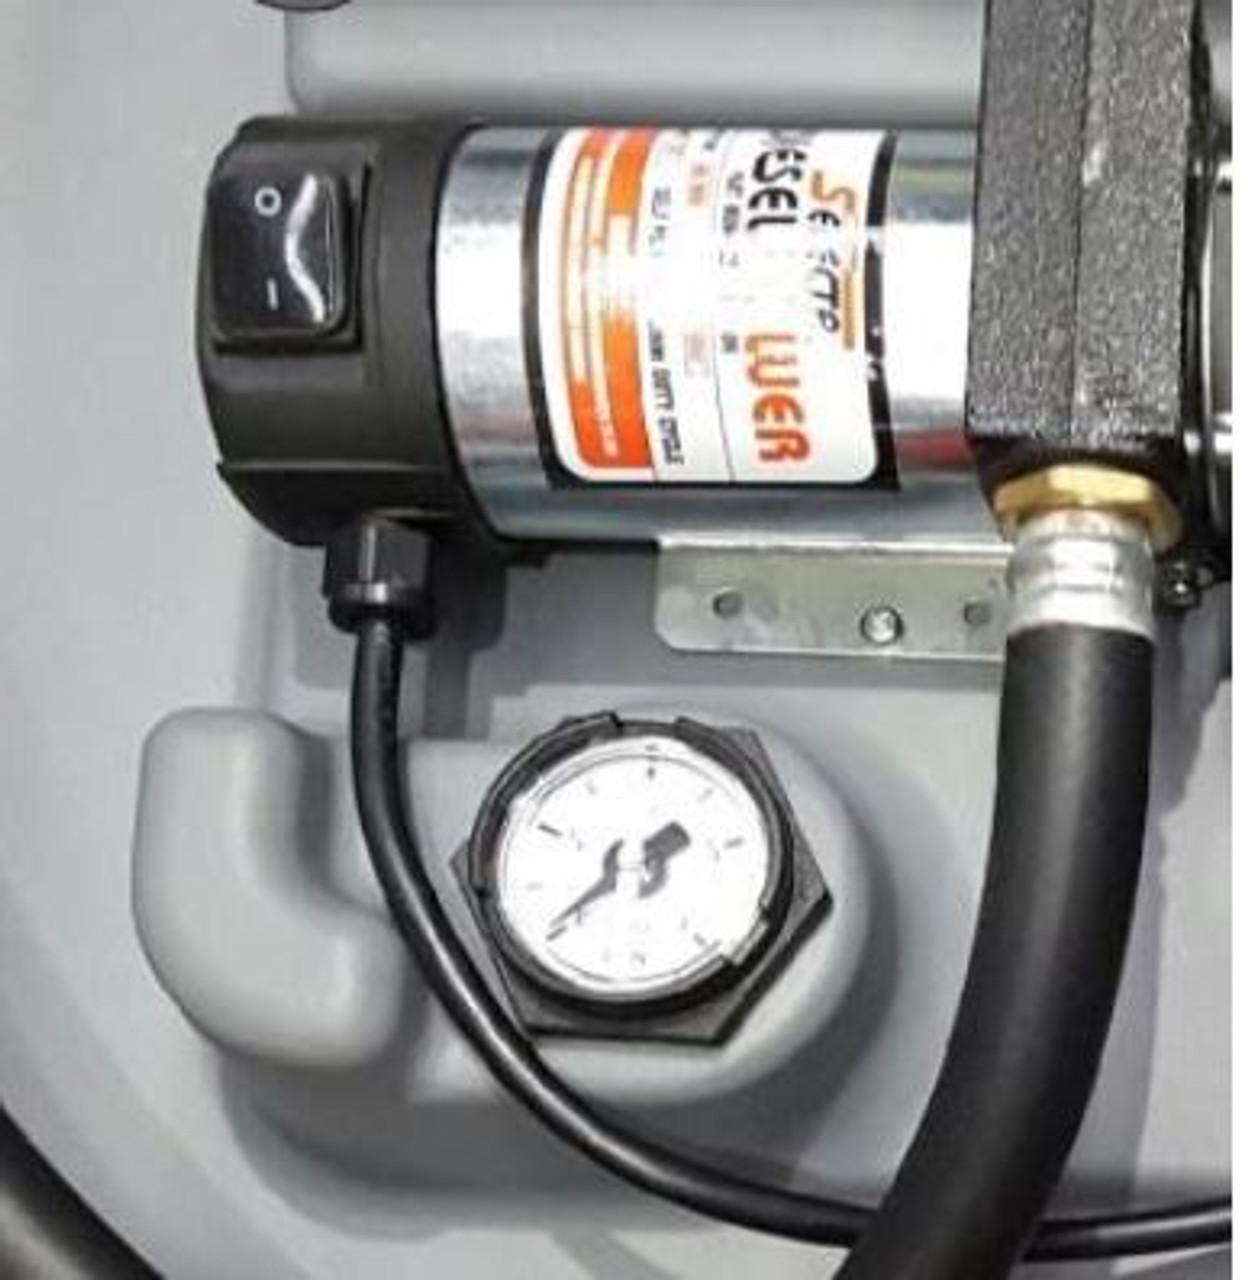 Diesel Fuel Tank for Utes